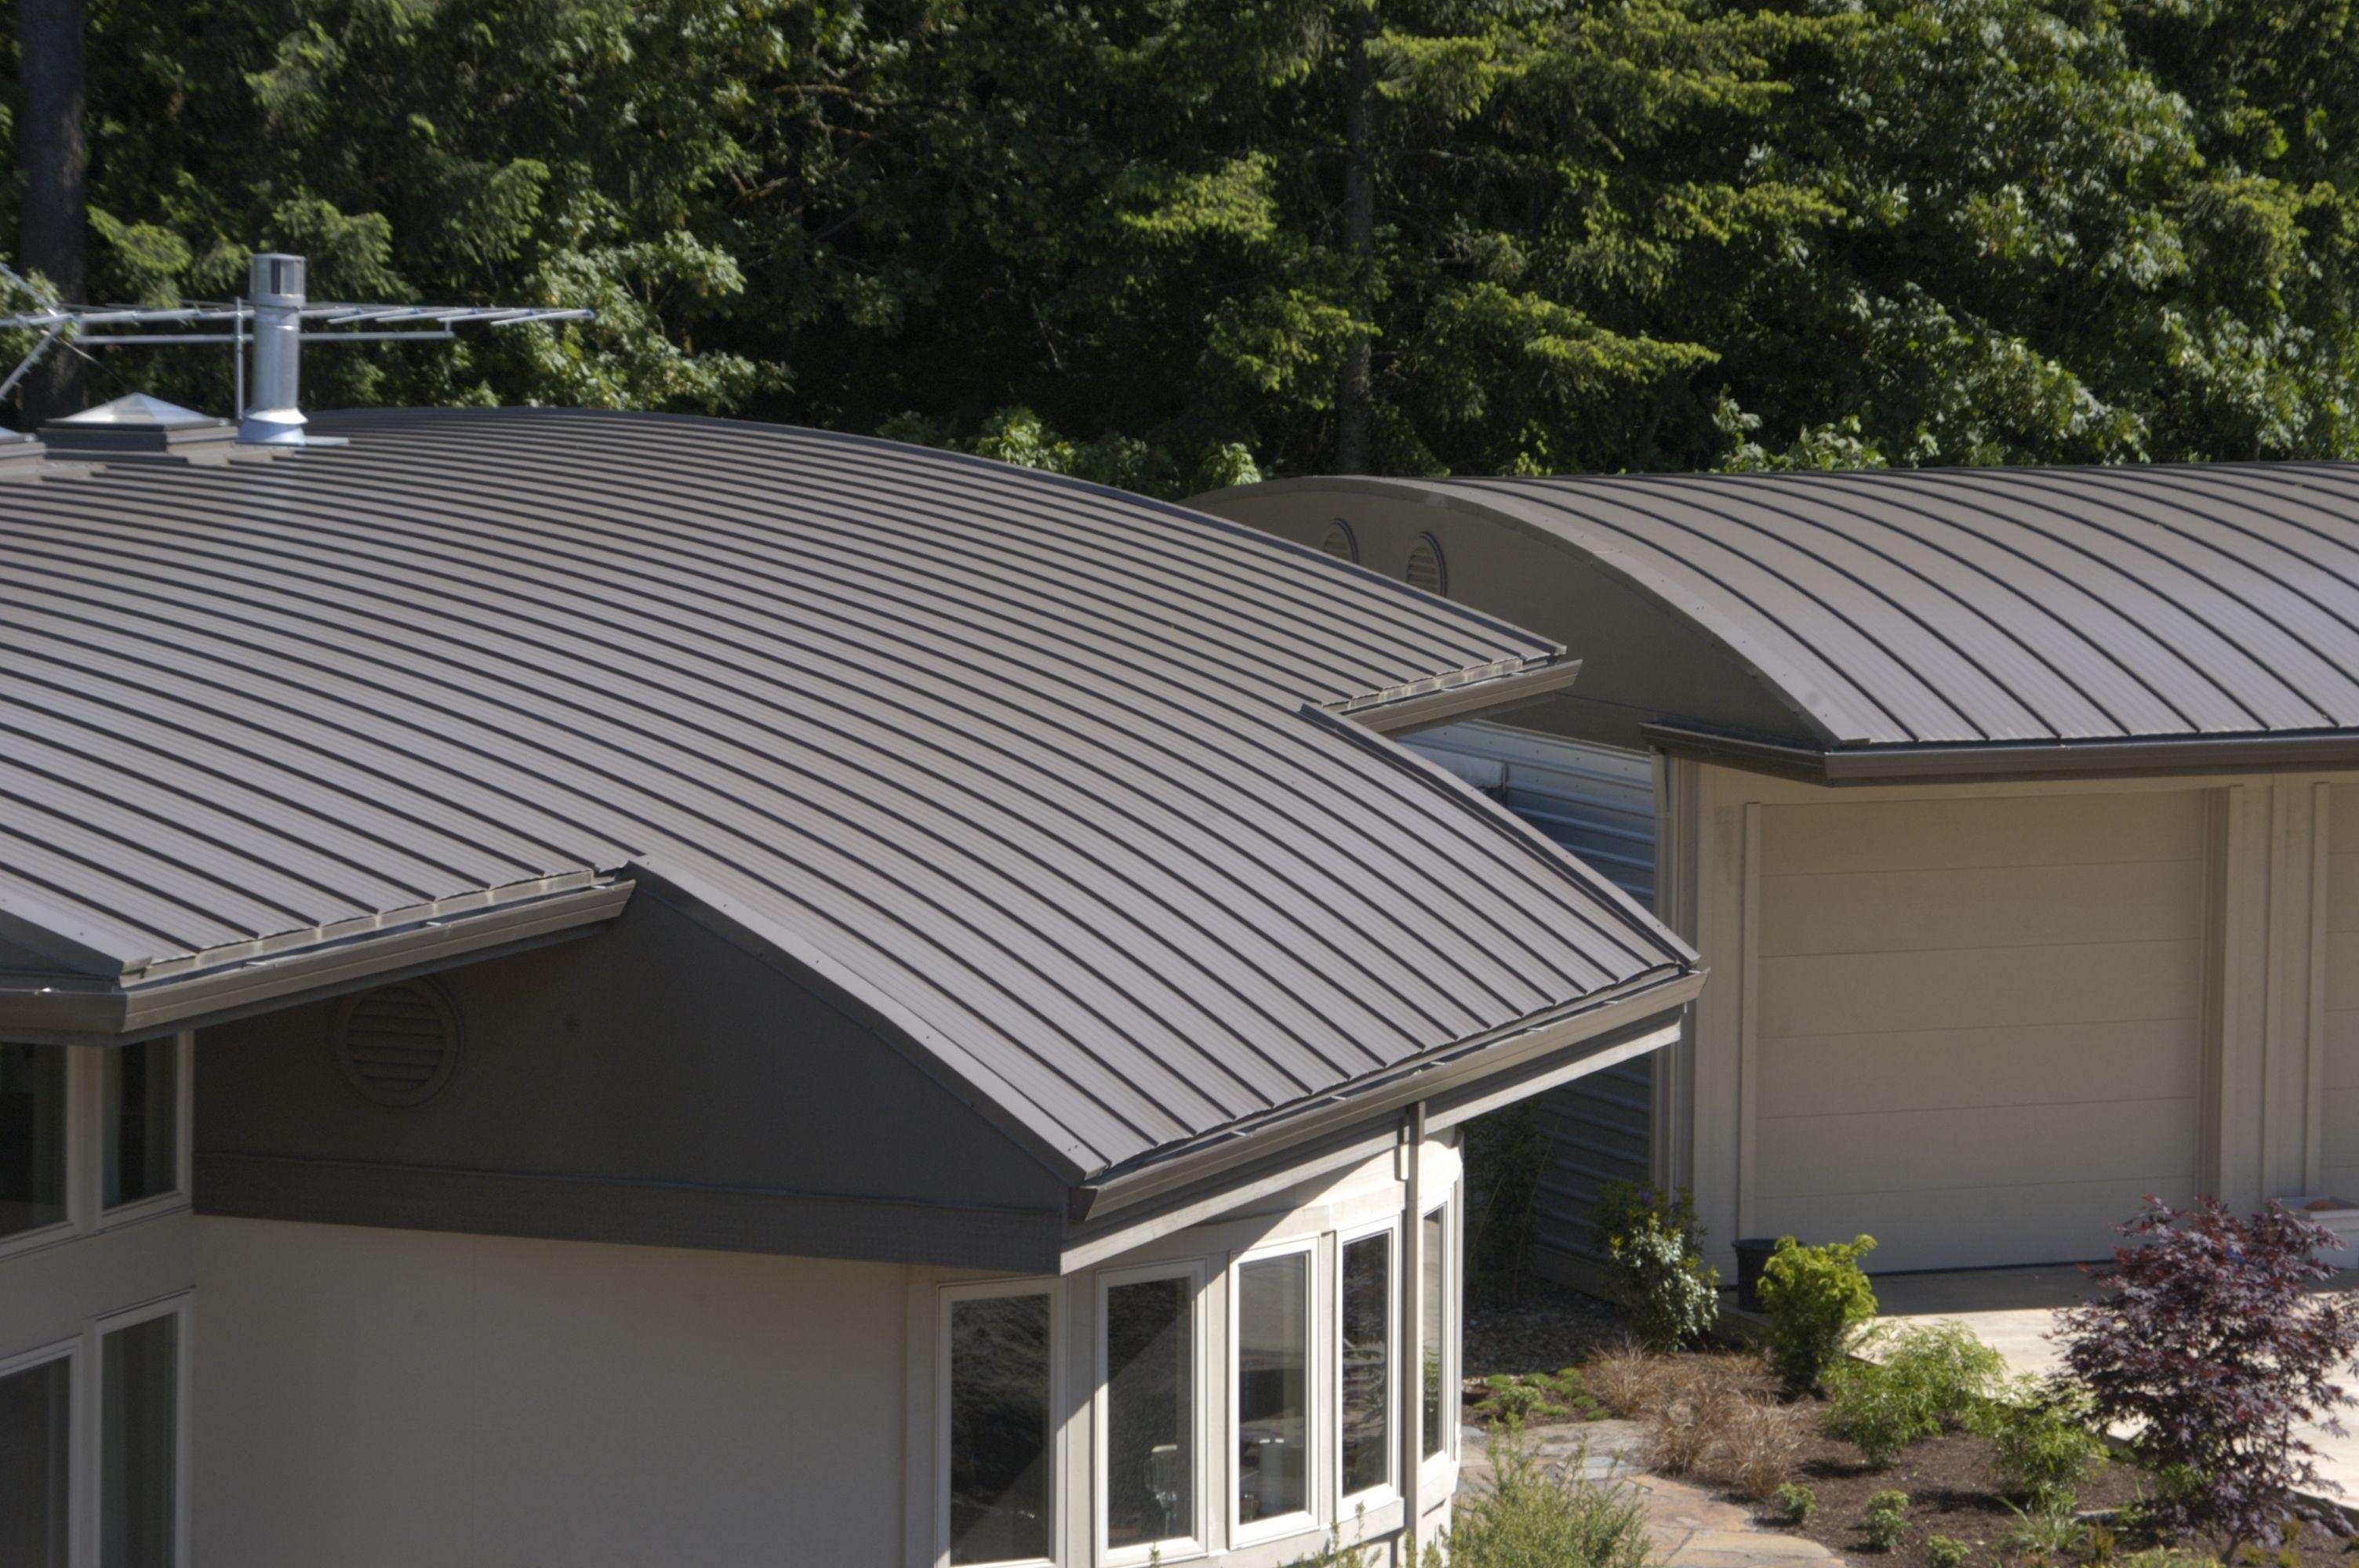 Standing Seam Custom Bilt Metal Roofing System Http Www Facebook Com Anrroofingsolar Metal Roofing Systems Metal Roof Corrugated Roofing